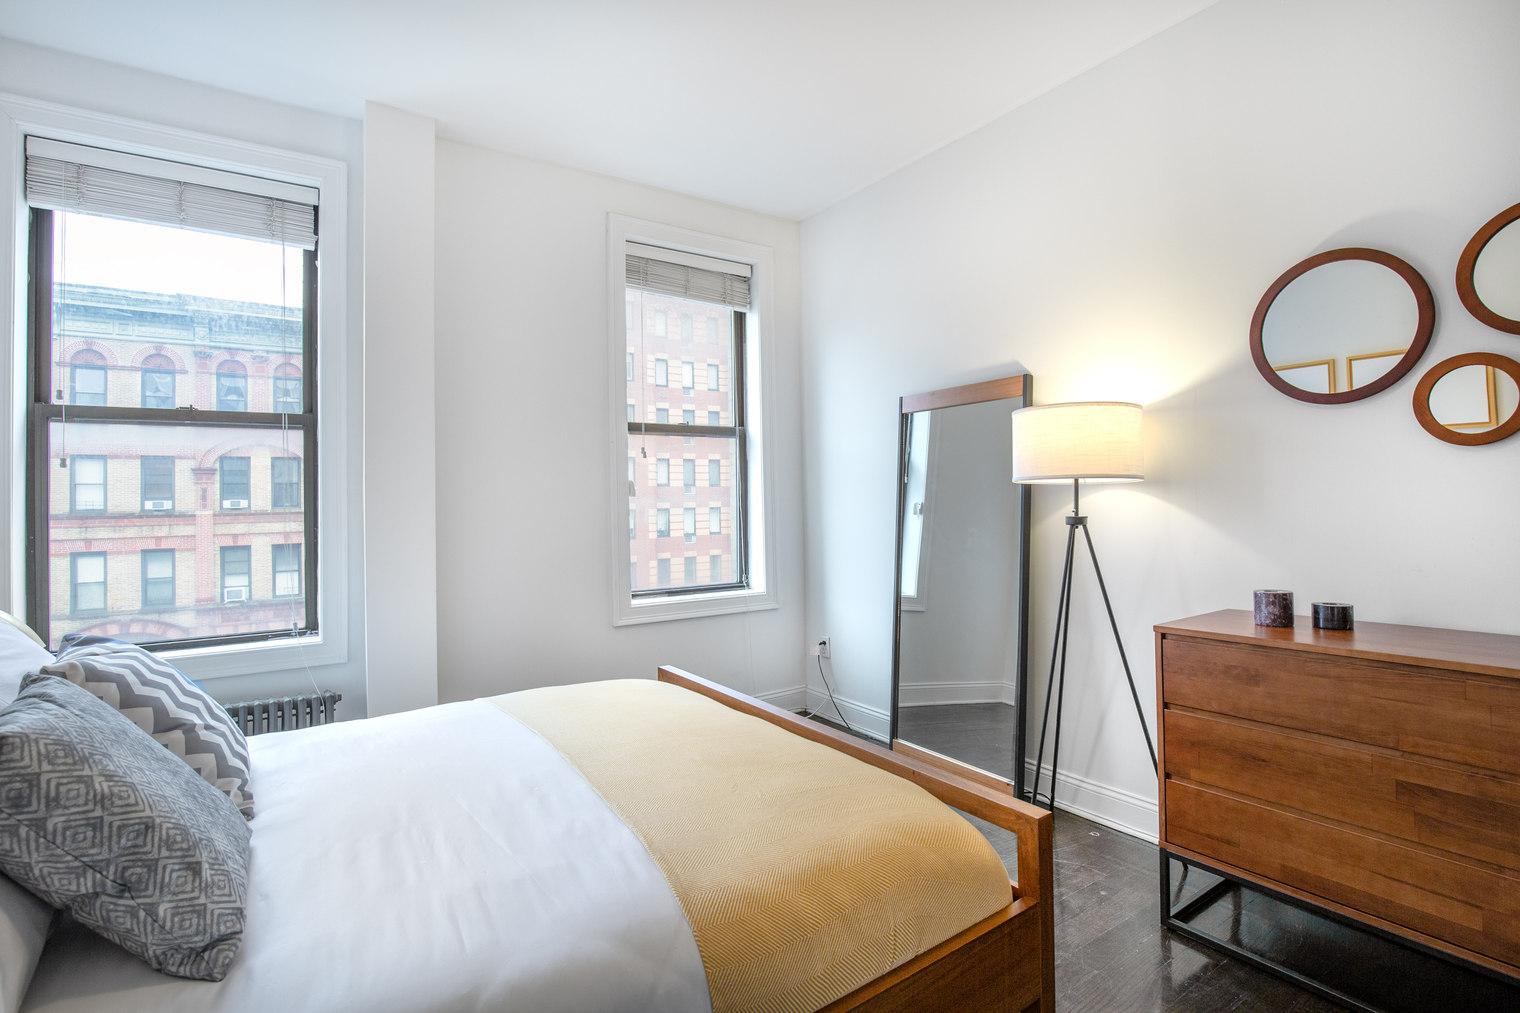 261 West 21st Street Chelsea New York NY 10011